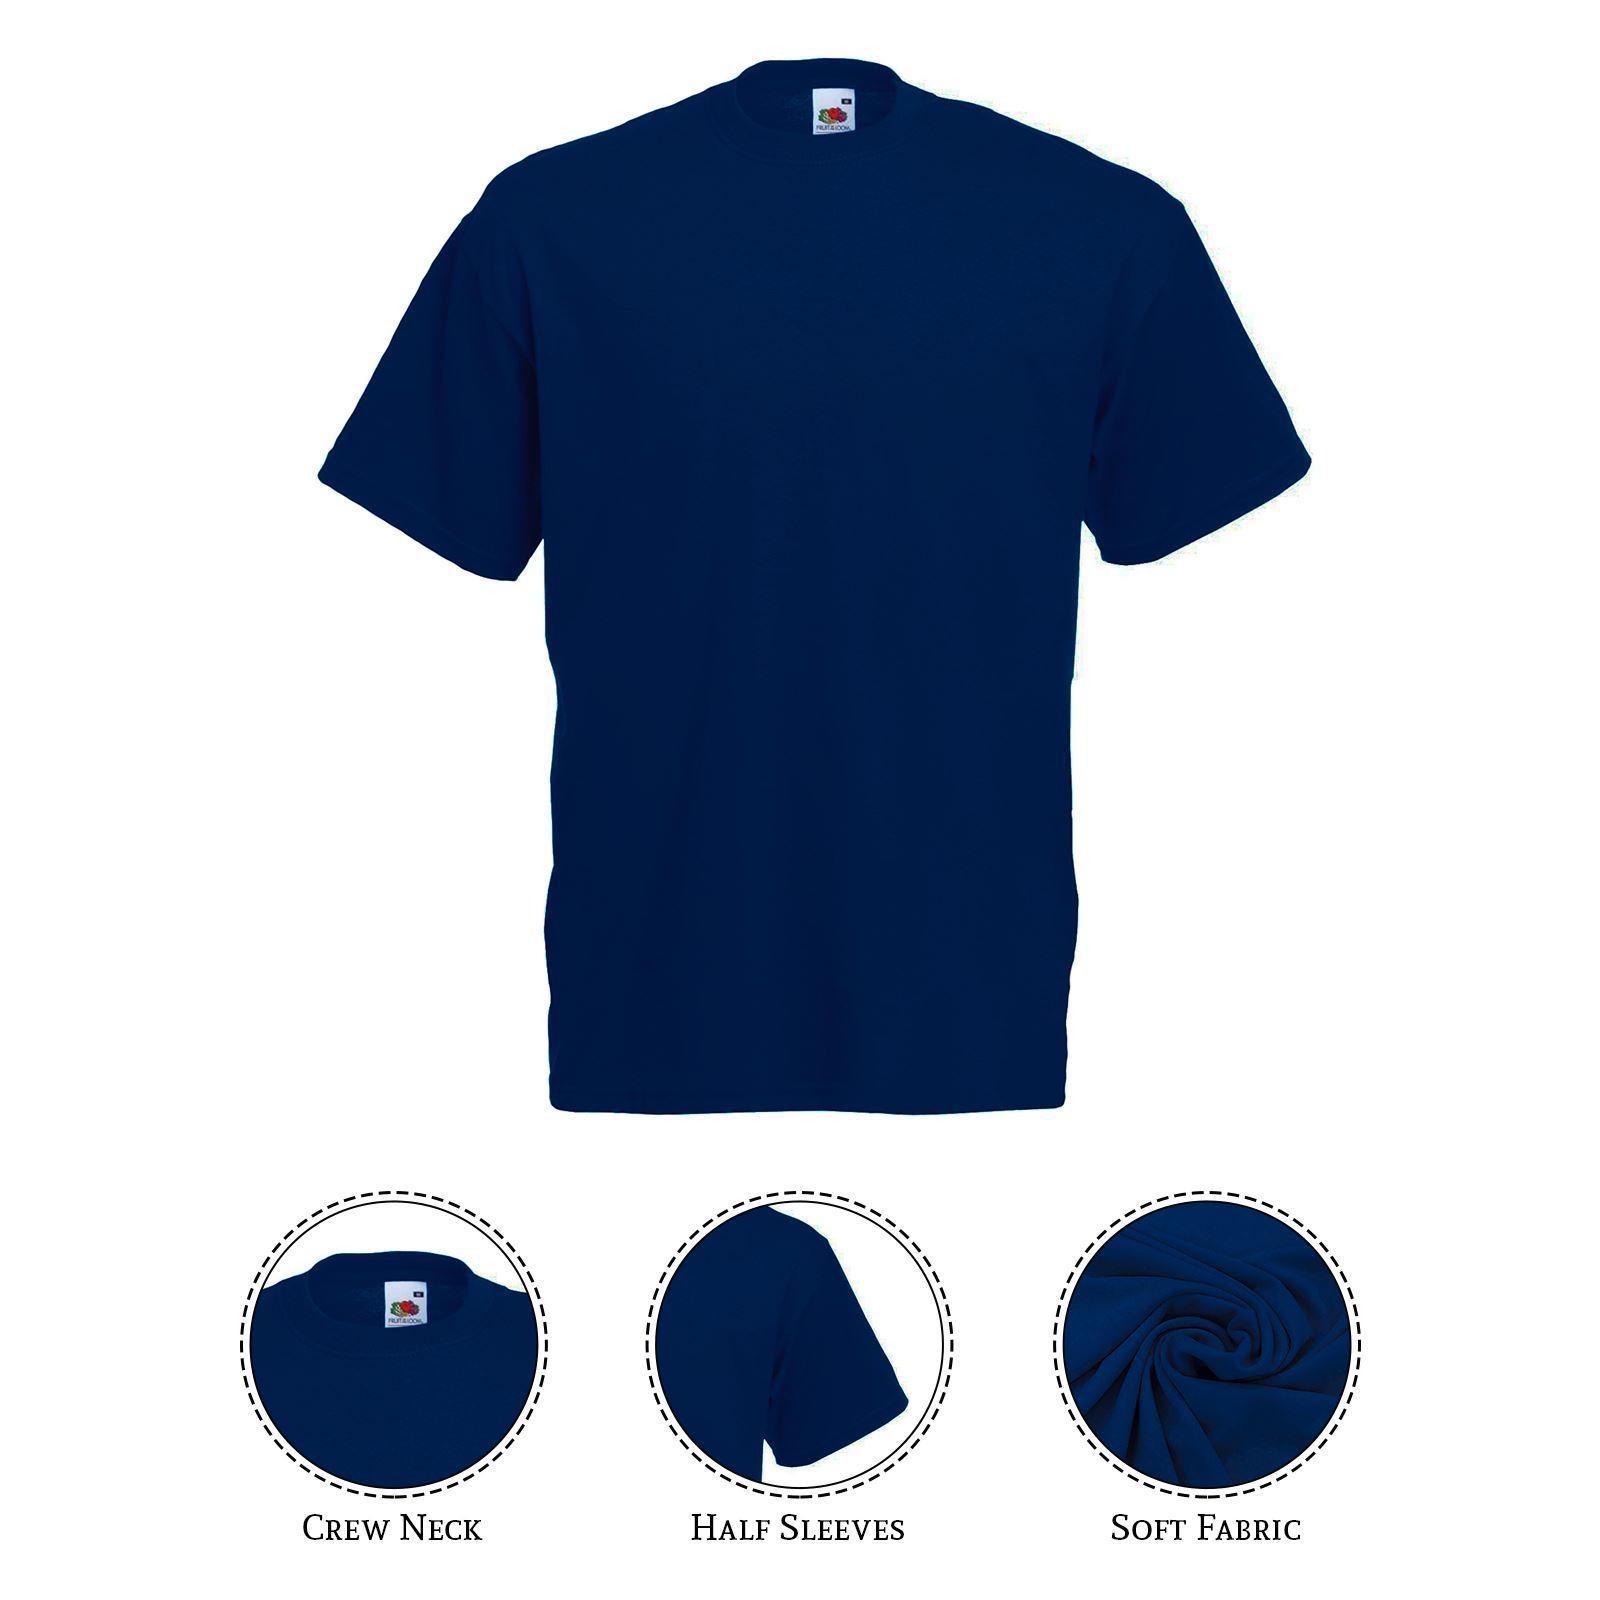 thumbnail 19 - Men-s-Fruit-Of-The-Loom-T-Shirt-Original-100-Cotton-Casual-Plain-Top-Tee